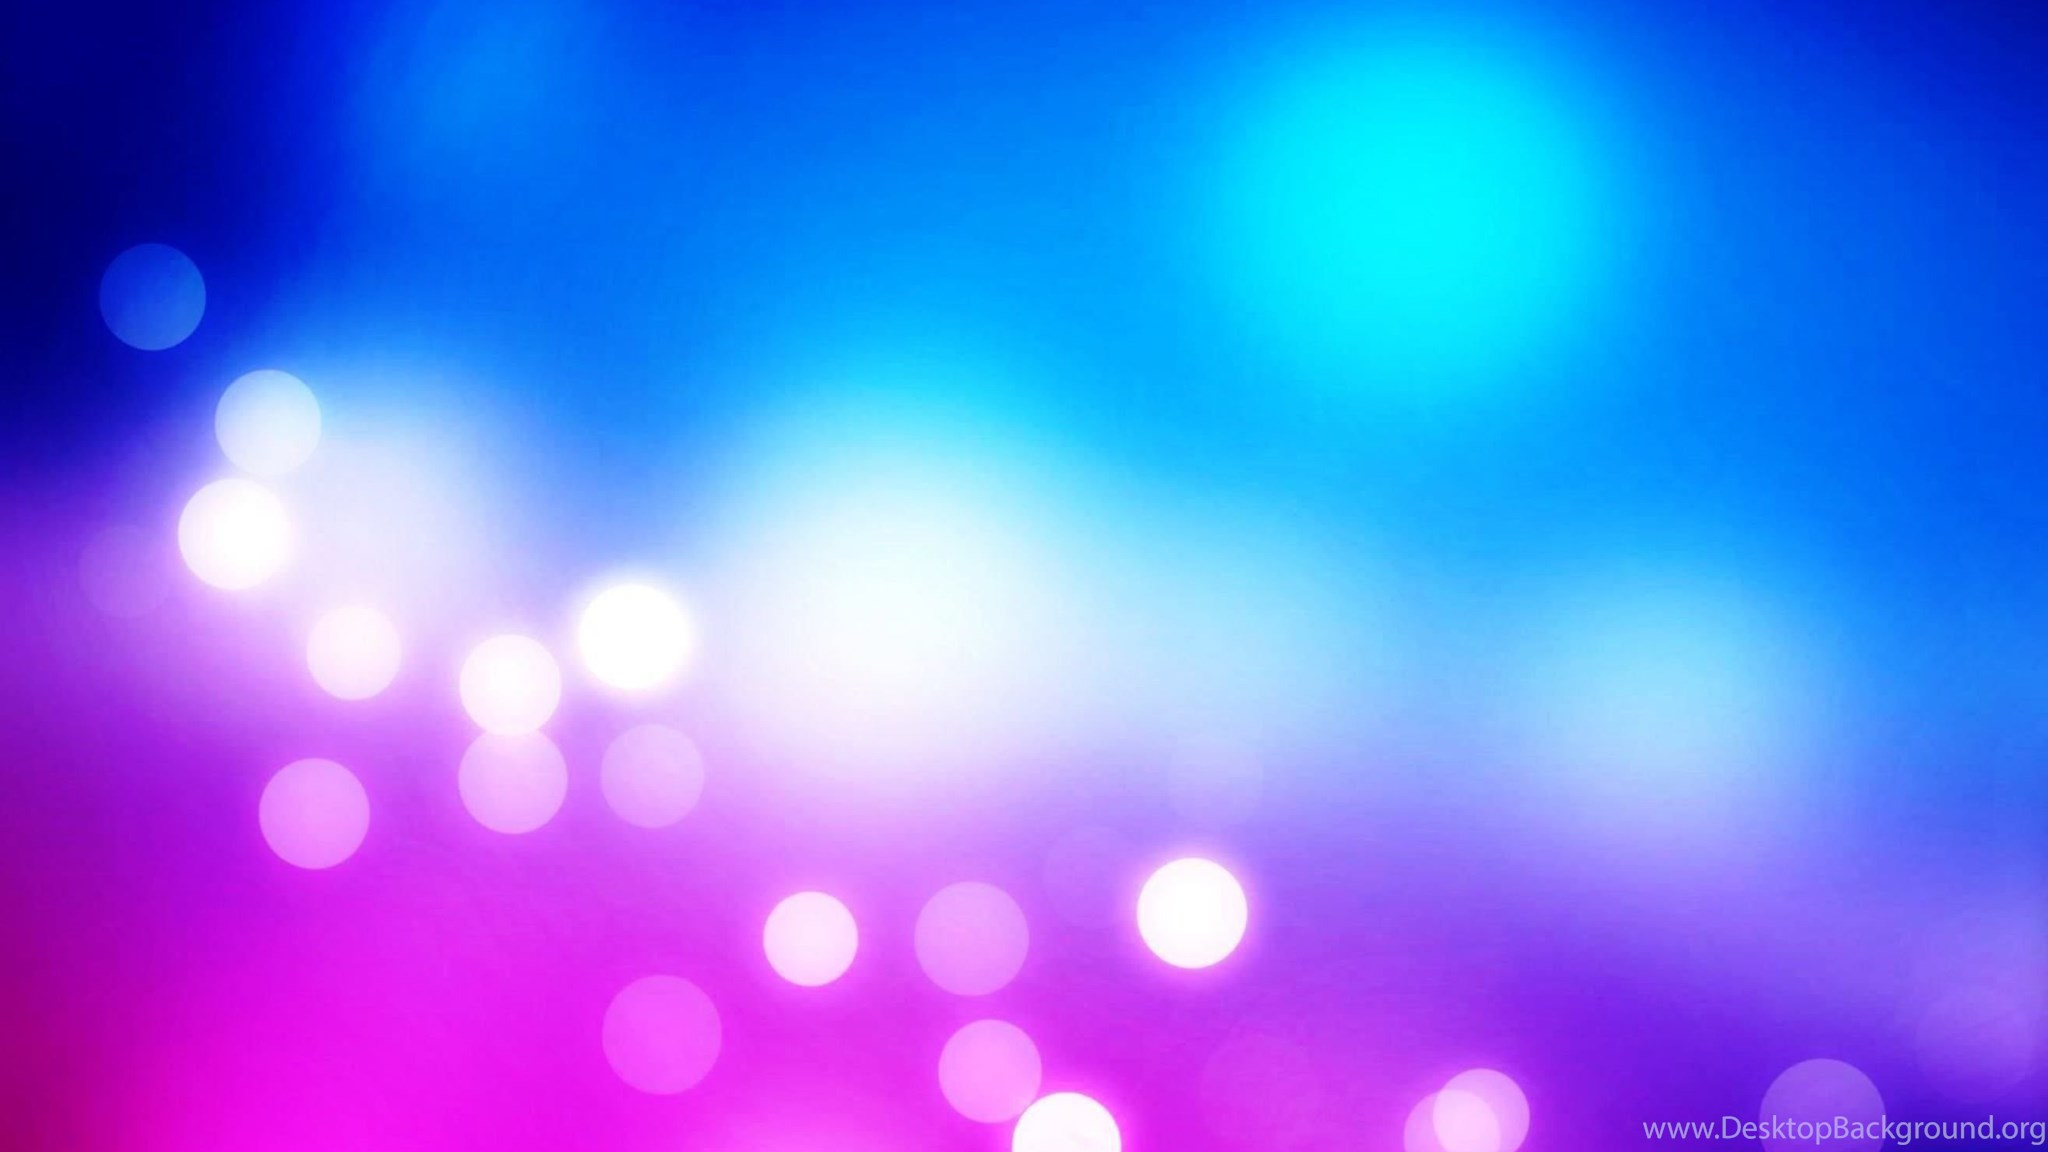 Cool Light Blue And Purple Backgrounds Desktop Background